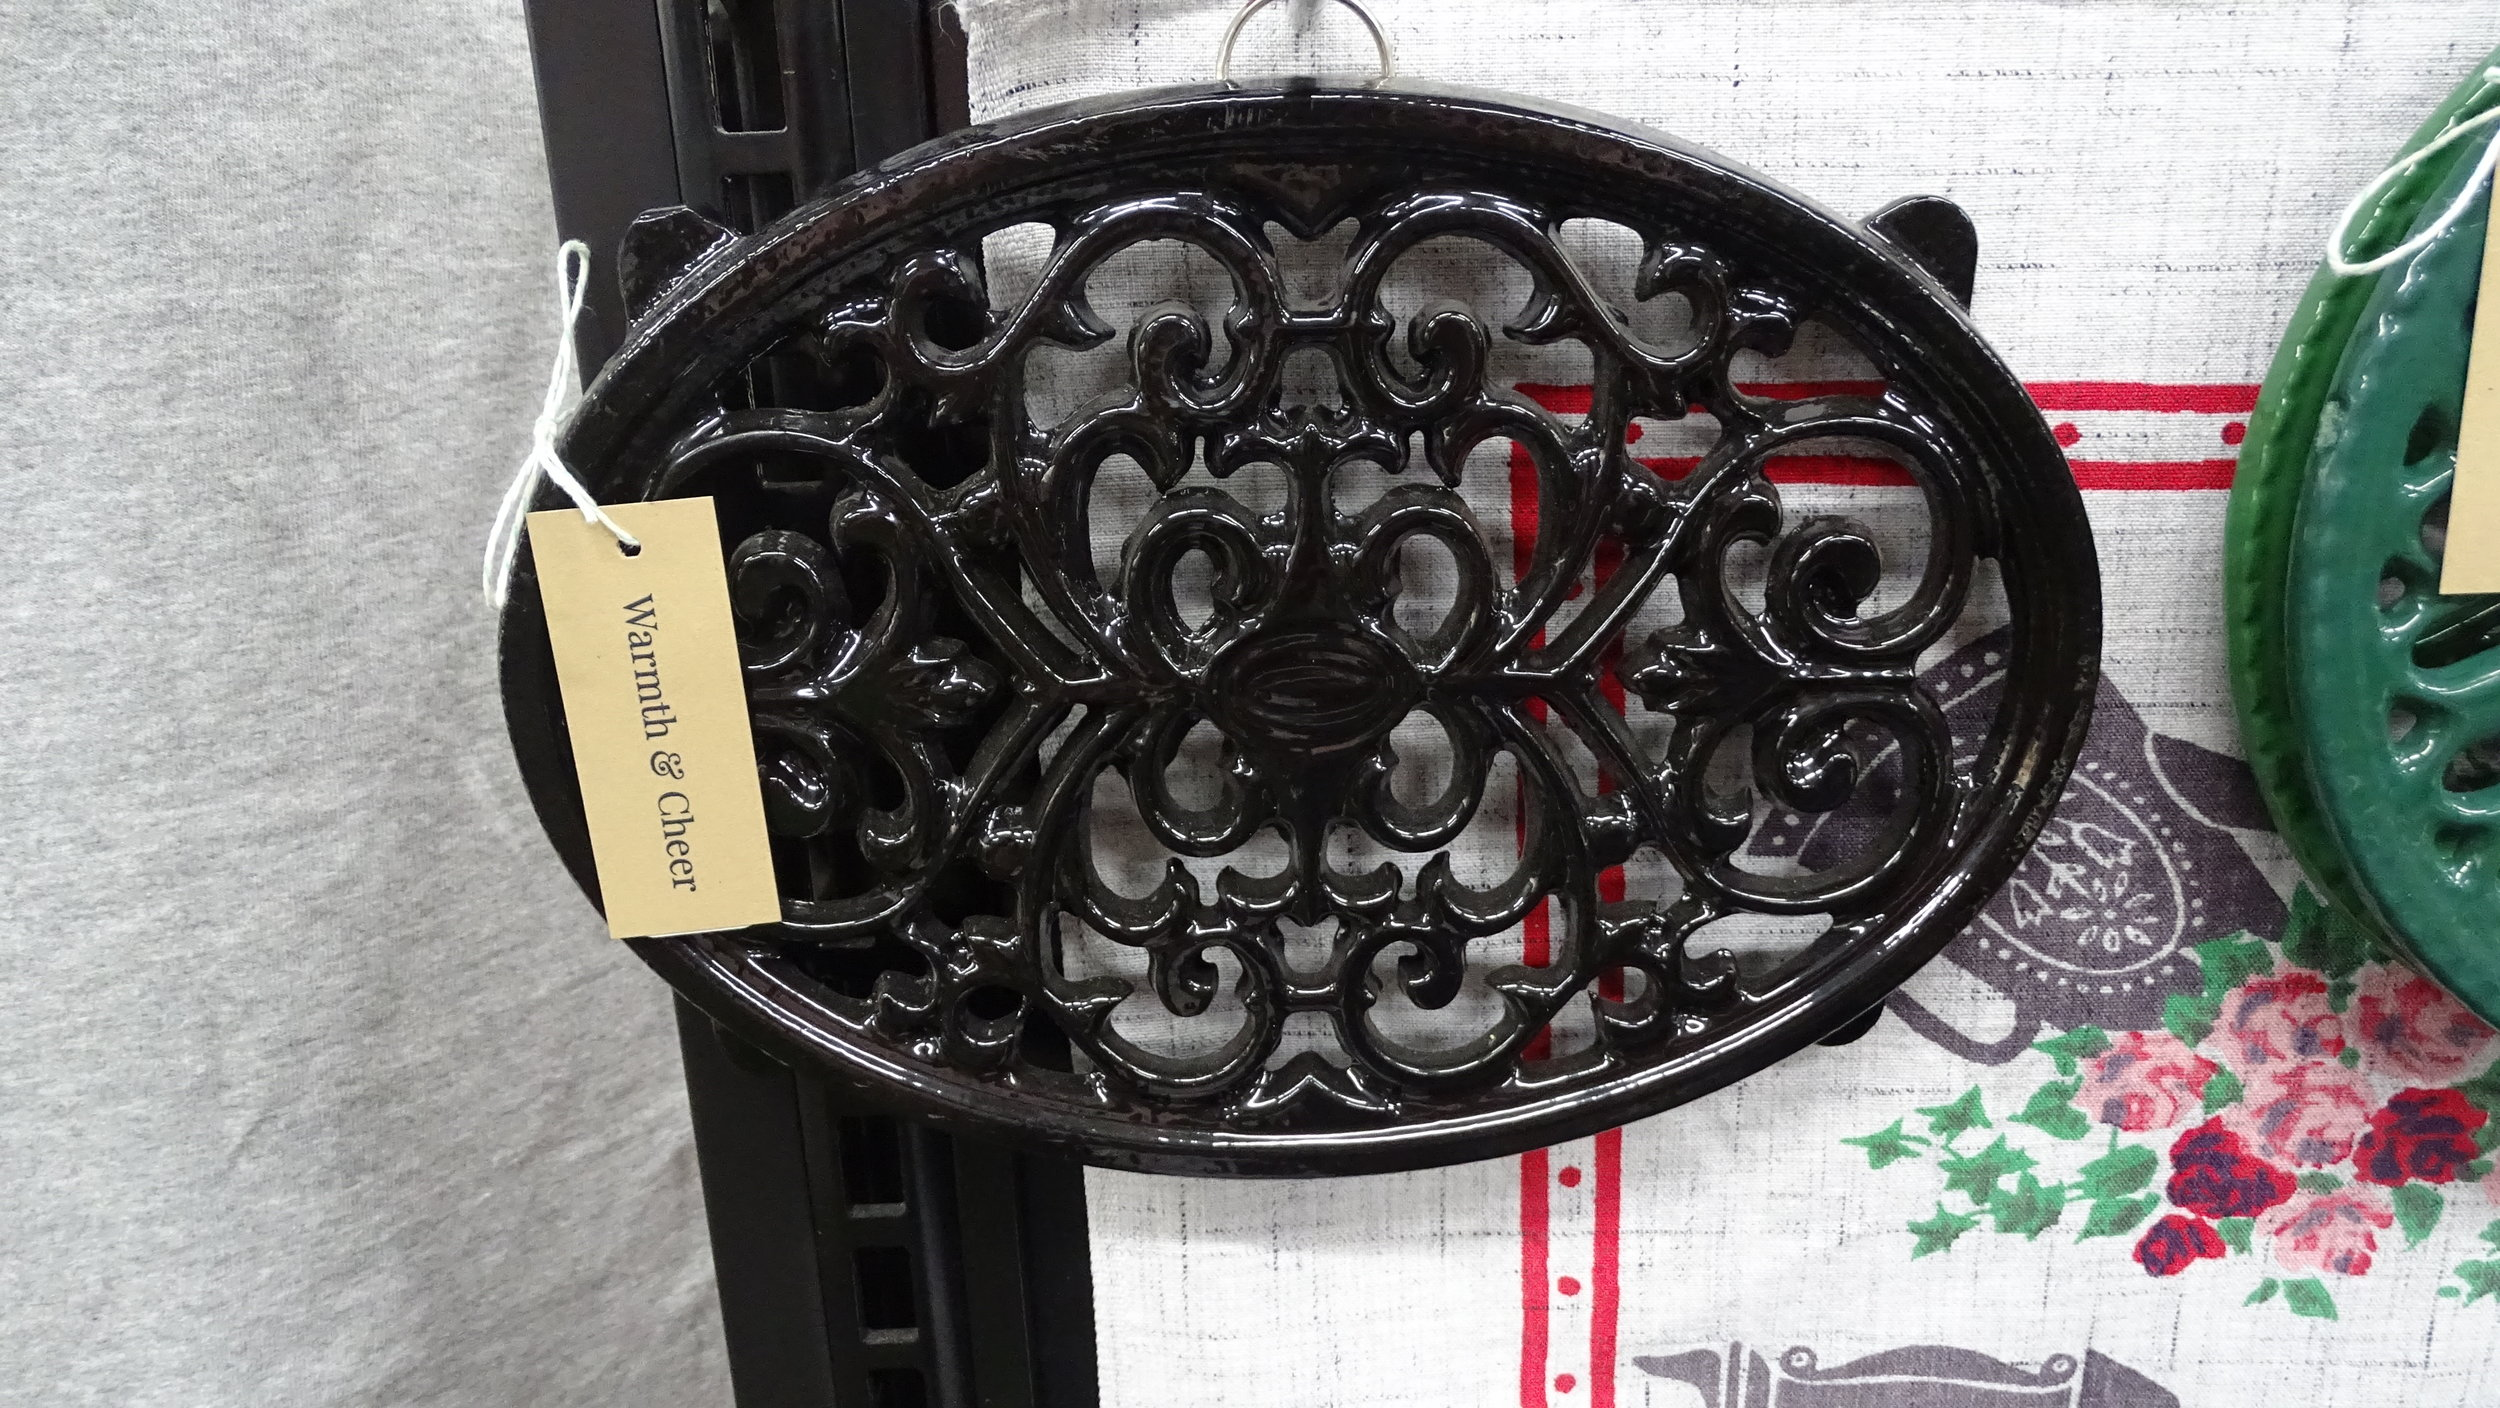 Black Enamel Cast Iron Trivet Oval Warmth Cheer Vintage Home Goods